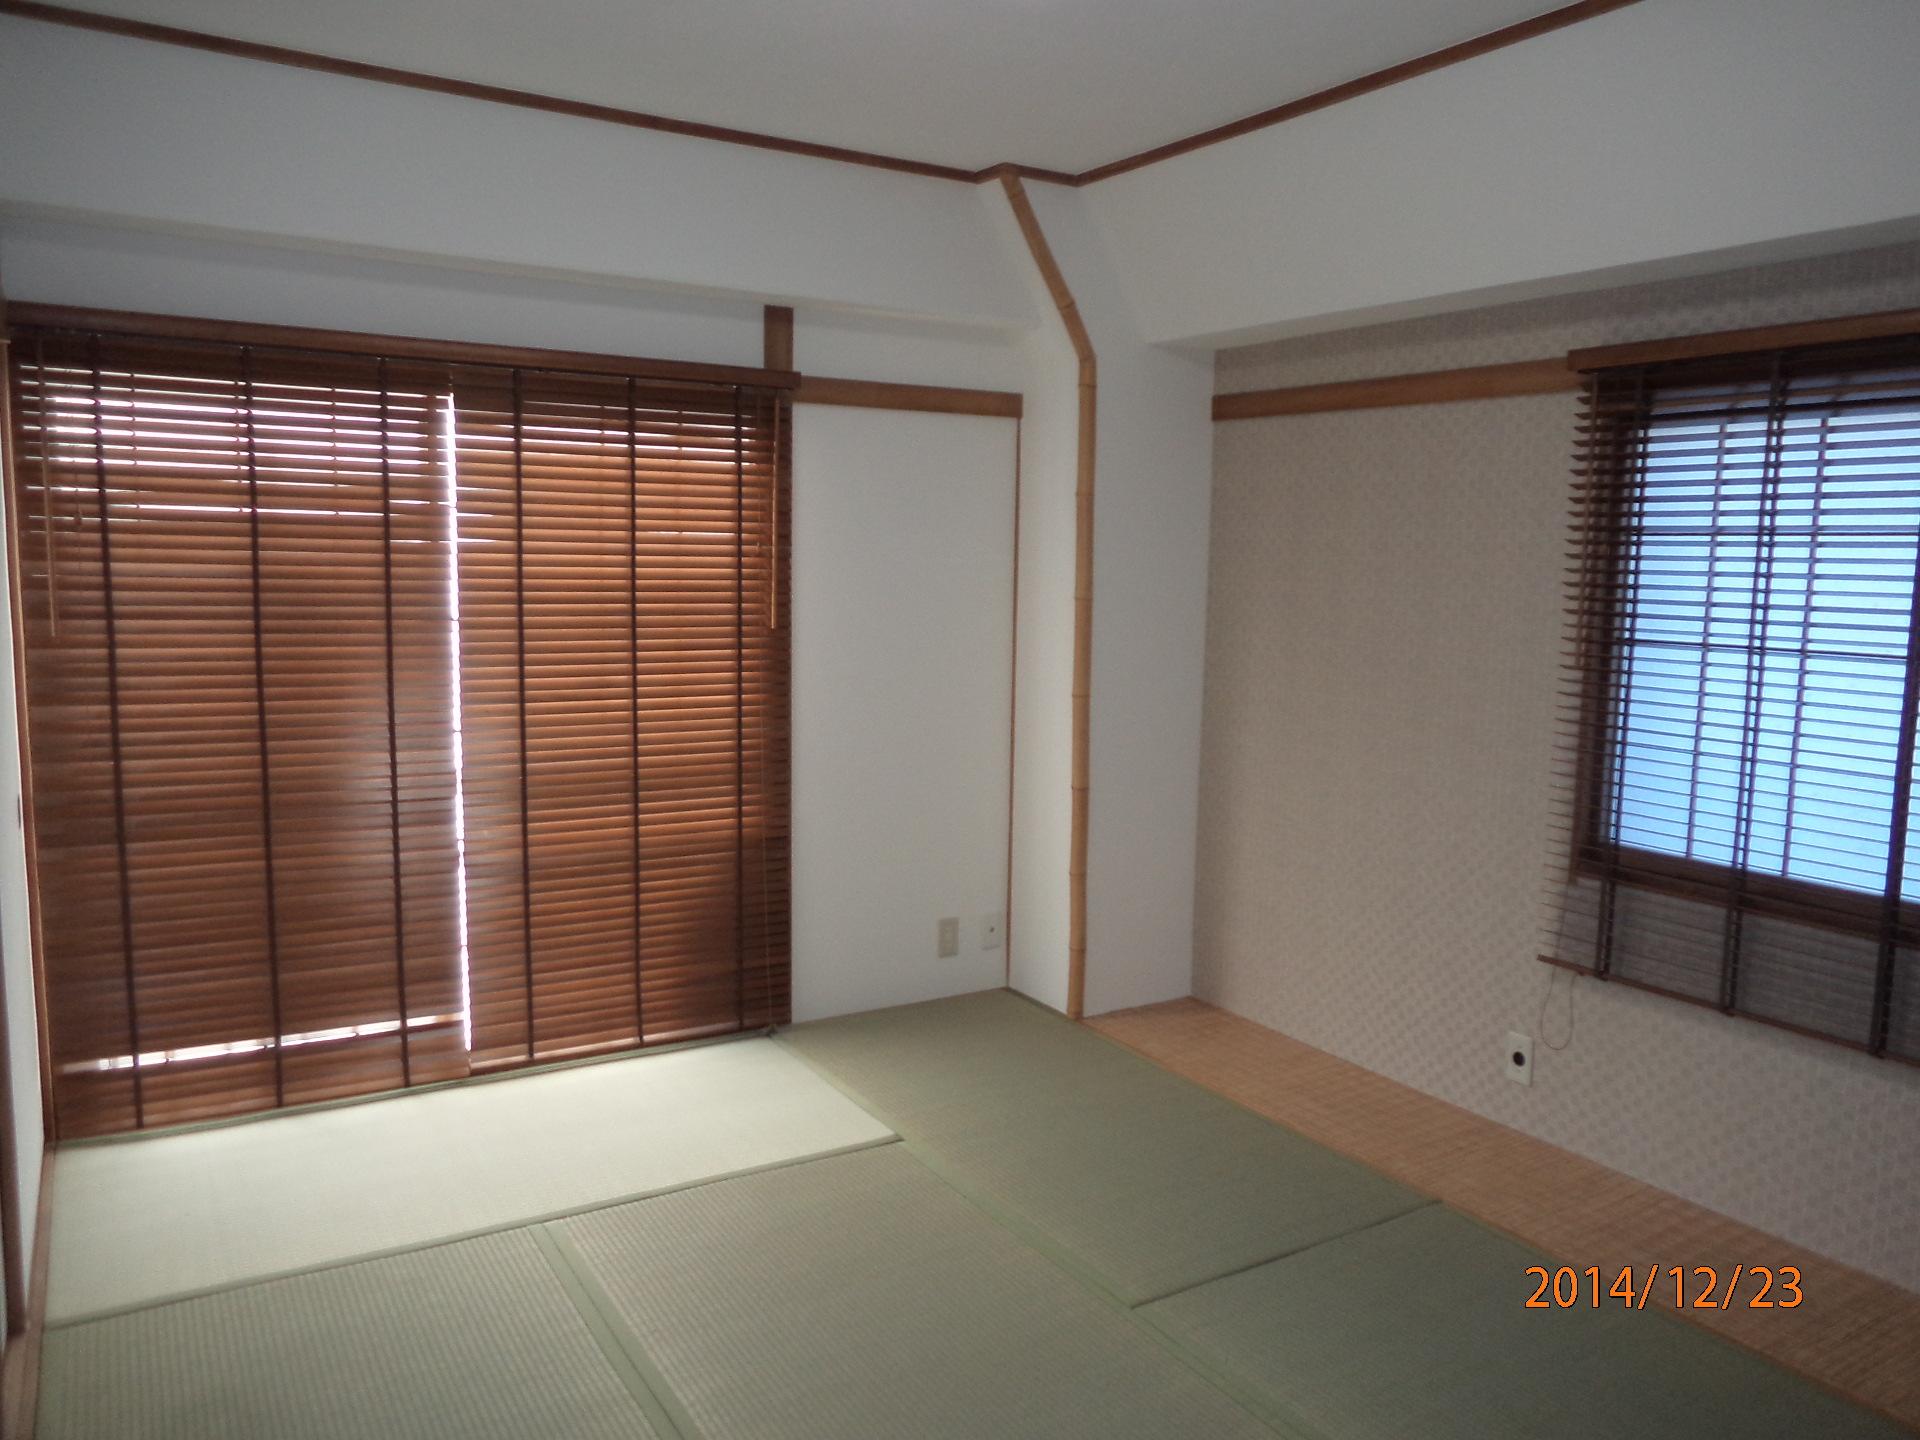 http://www.lifeplanet.jp/work/PC230005.JPG